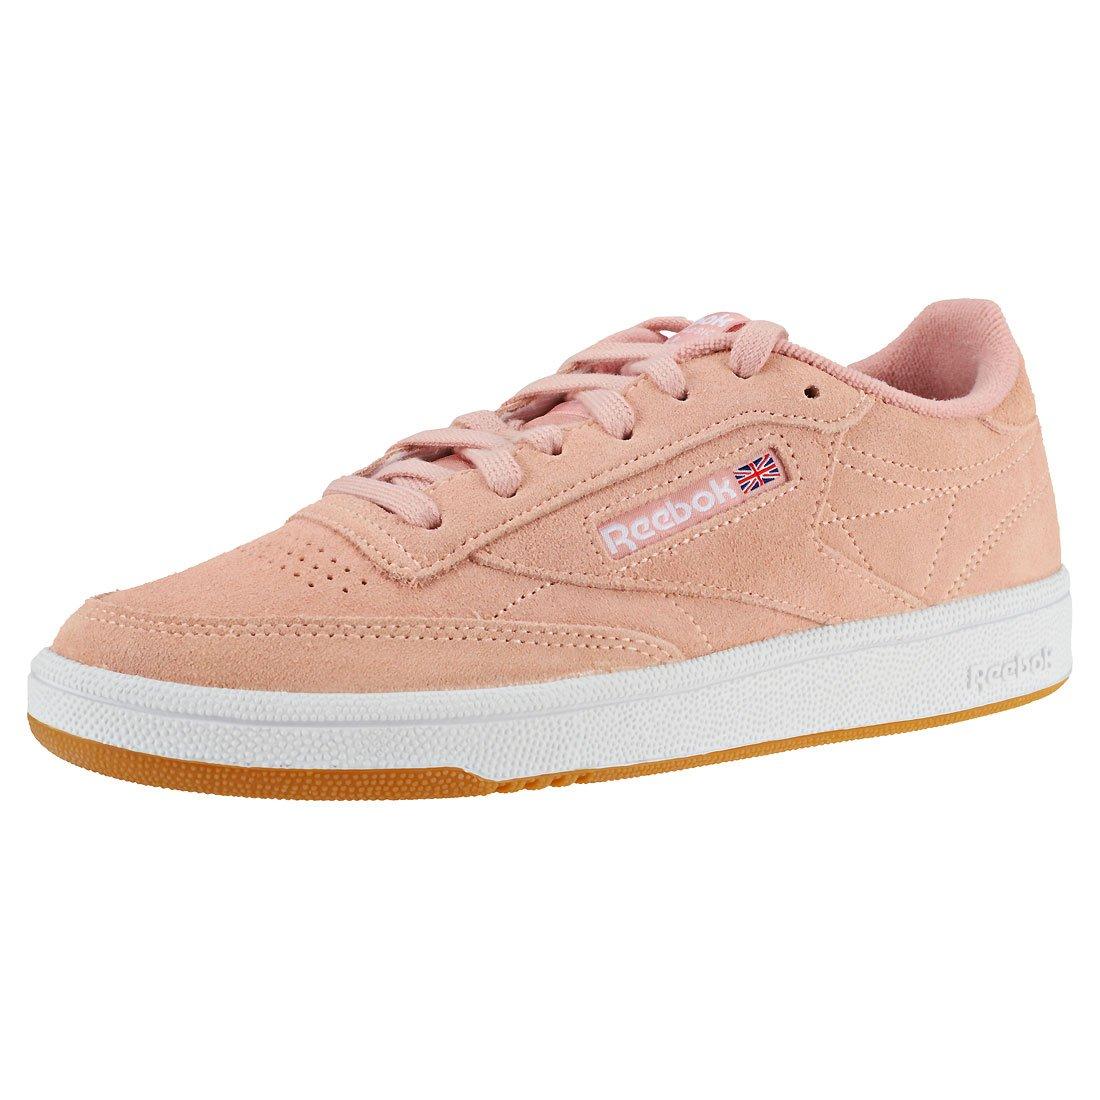 Reebok Damen 85 Club C 85 Damen Fitnessschuhe Mehrfarbig (Premim Basic 3/Peach Twist/Gum/Weiß 000) 580044